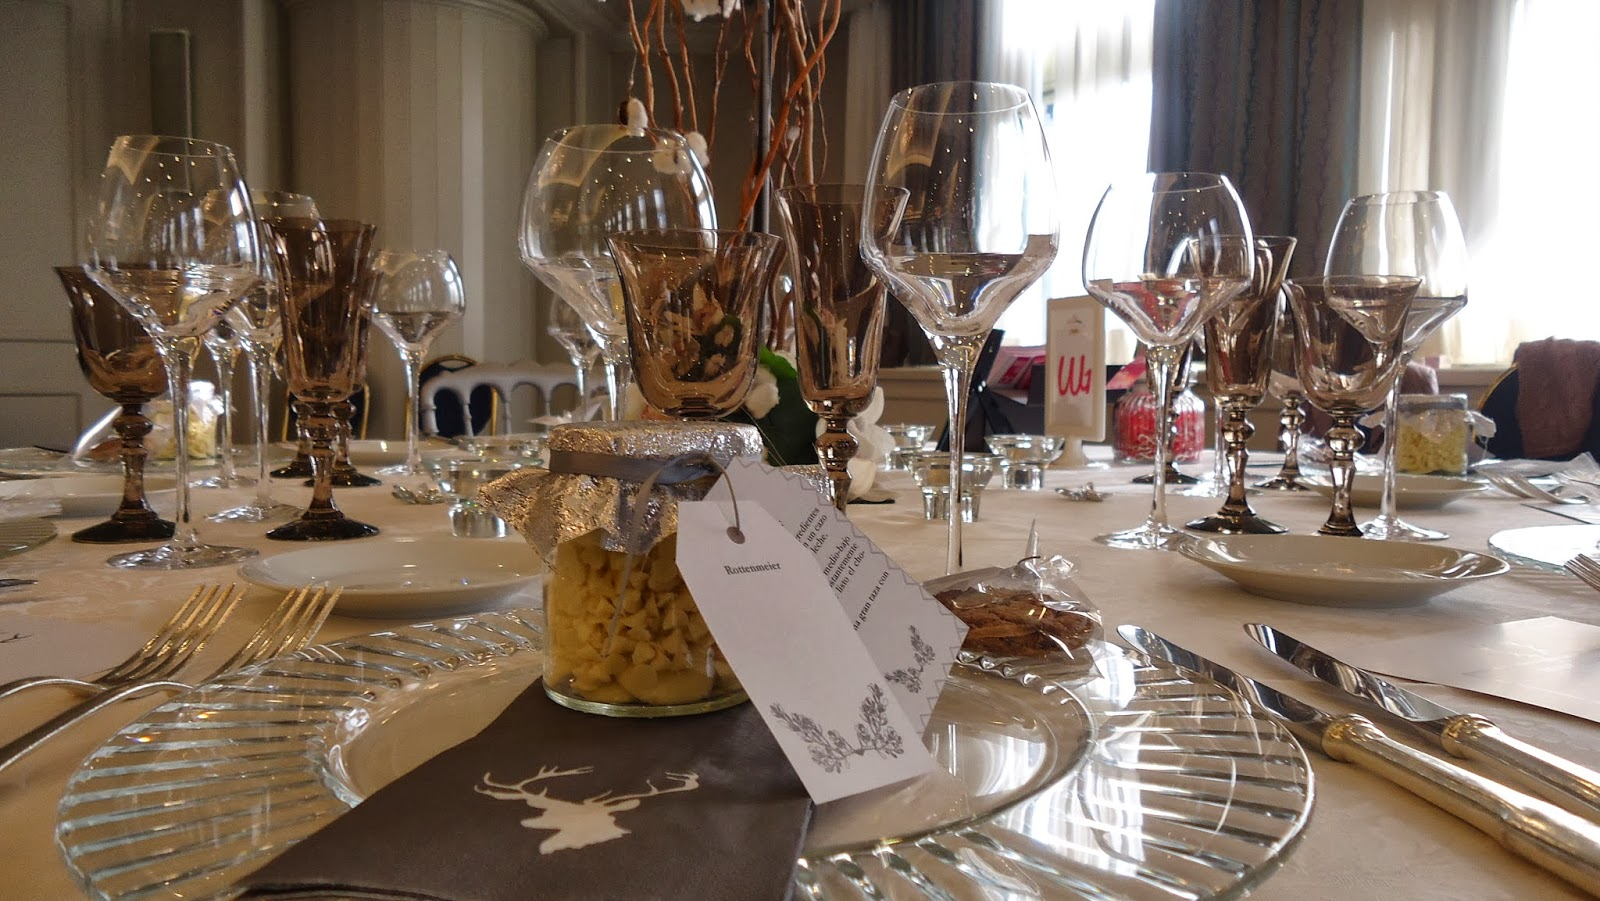 Las bodas de raquel mesas de banquete de bodas decoradas por wedding planners - Mesas decoradas para bodas ...